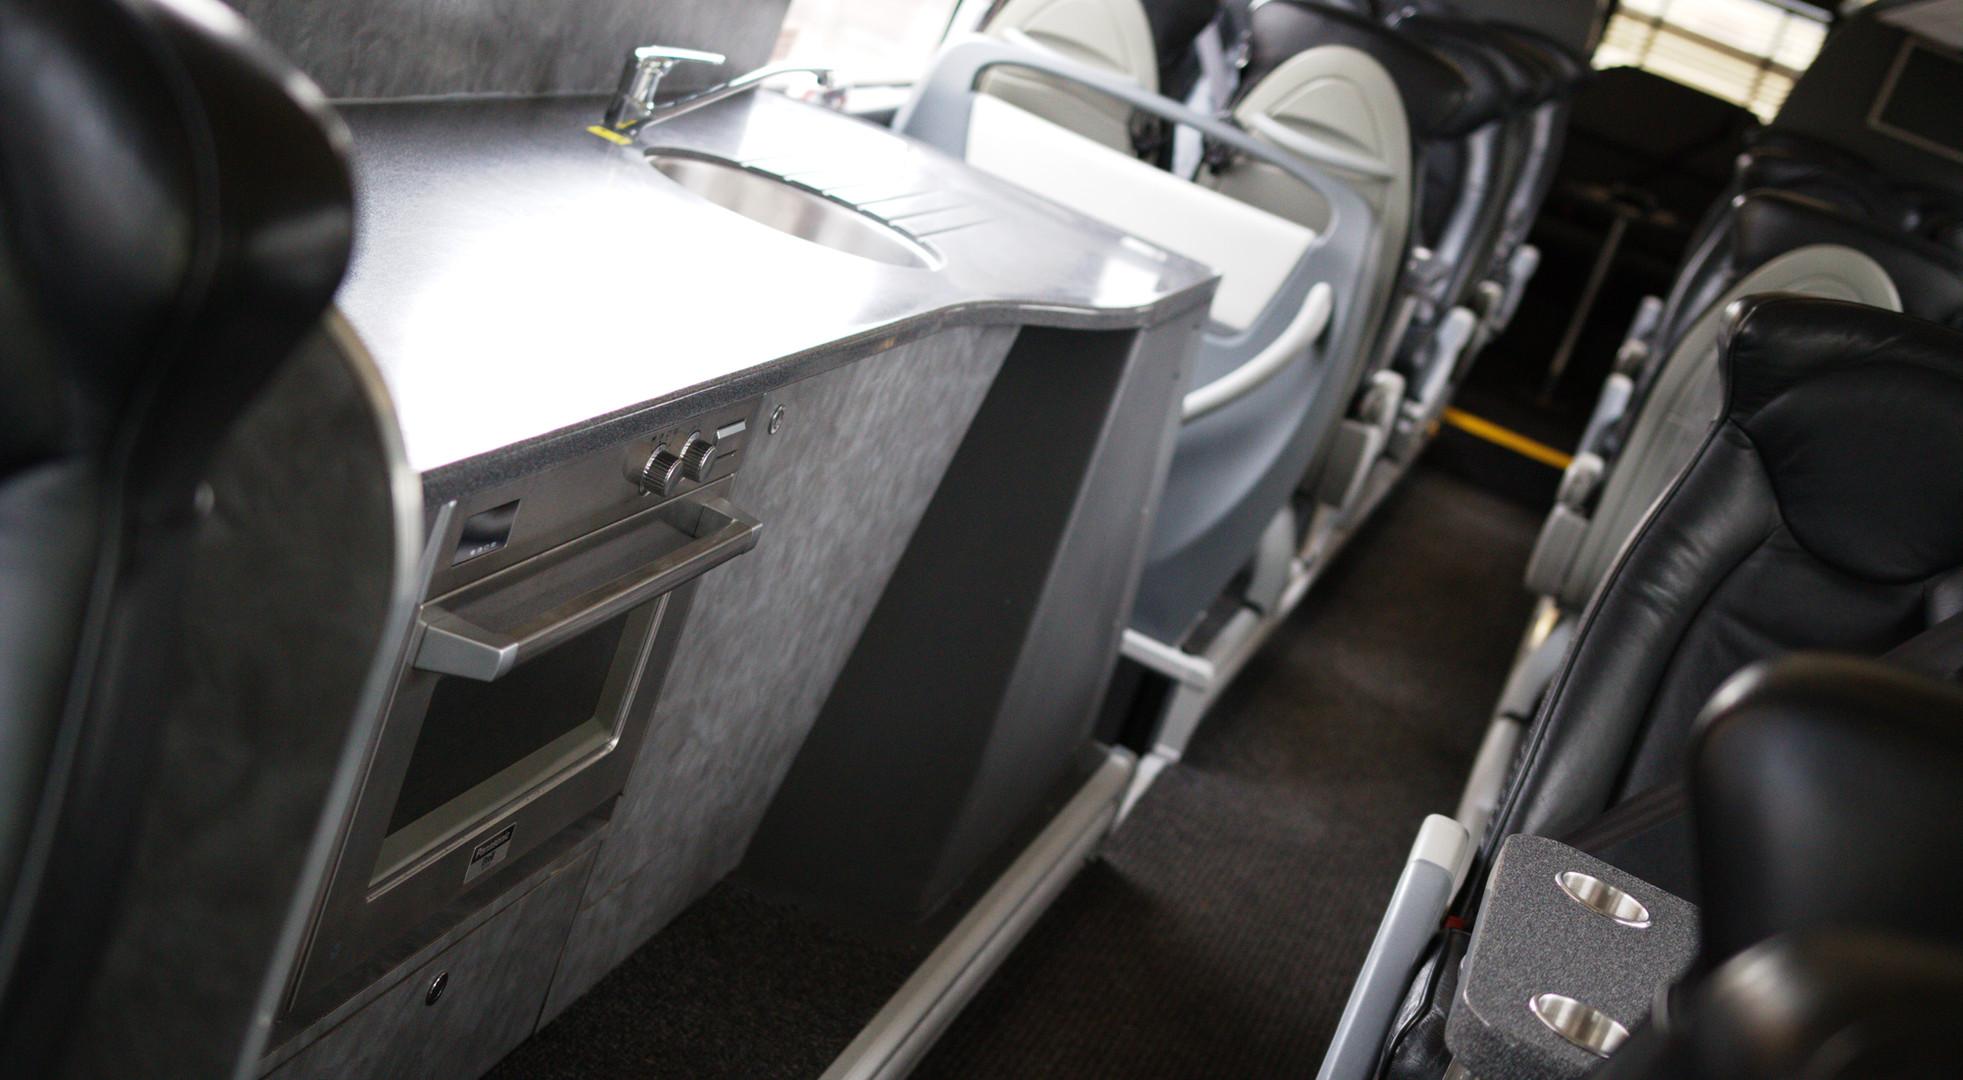 Scania Irizar VIP (33 seats)